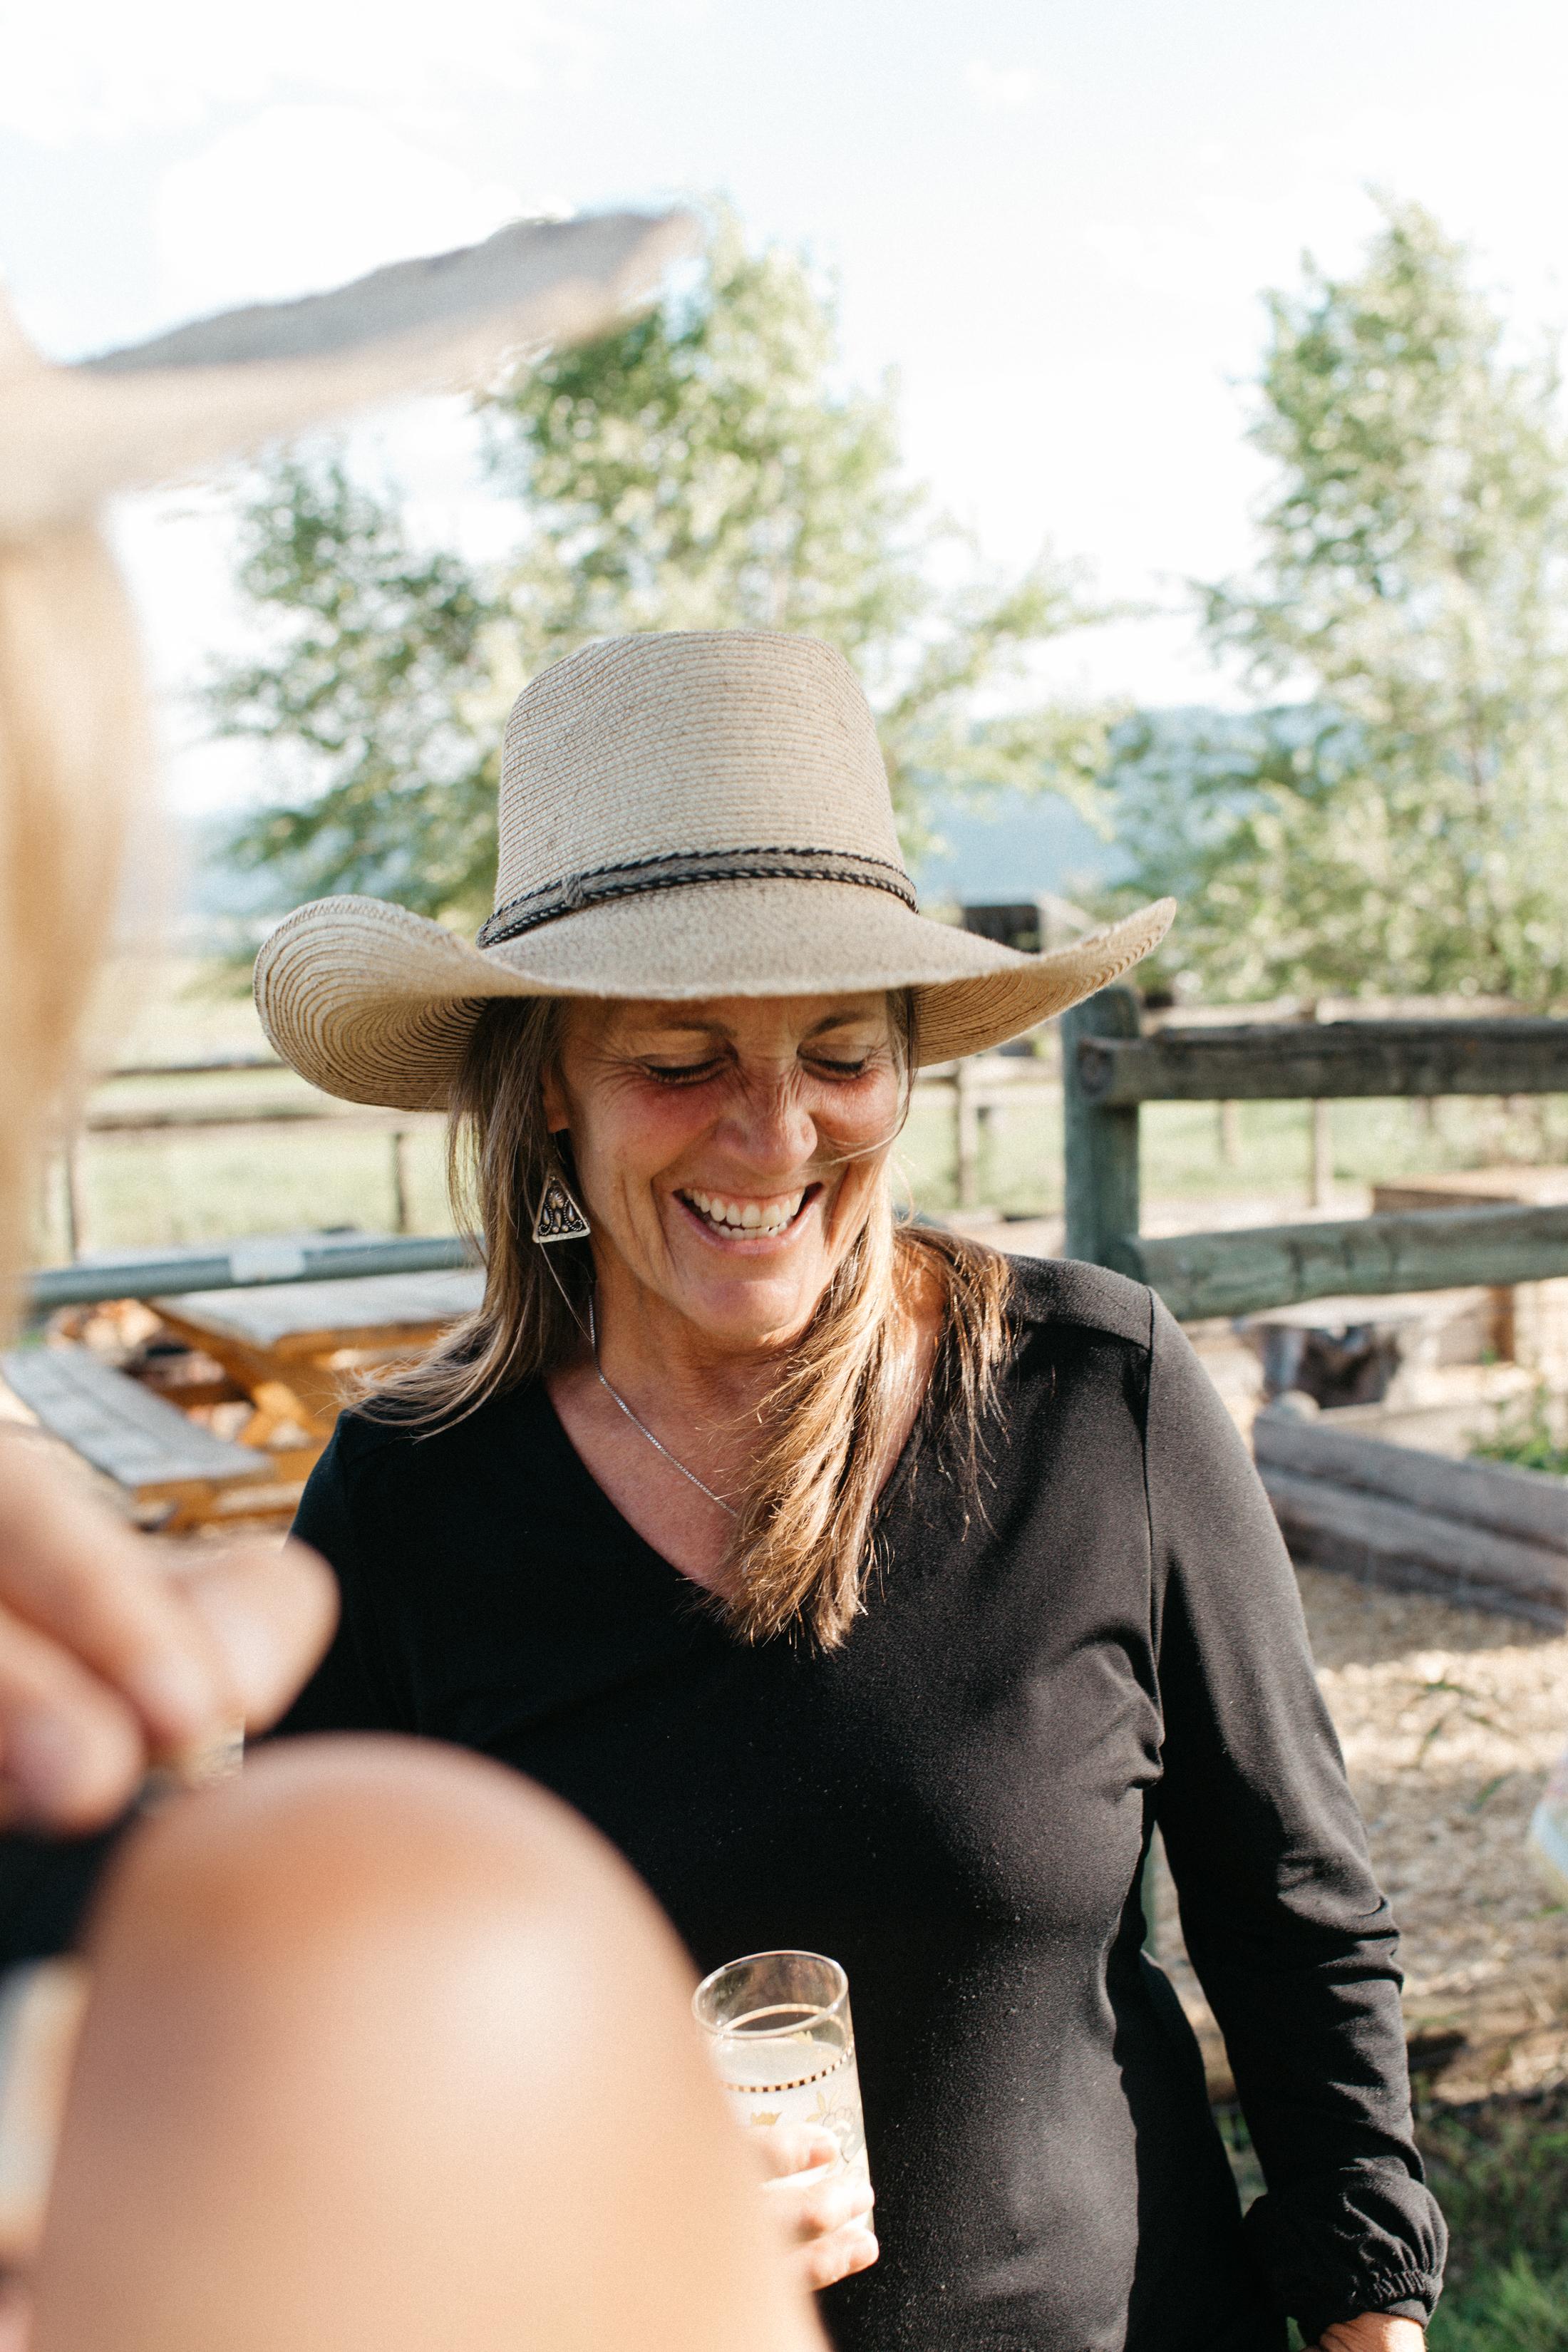 Cory_Carman_Lady_Steaks_Campaign_Wallowa_Oregon_Carman_Ranch_By_Talia_Jean_Galvin--12.jpg